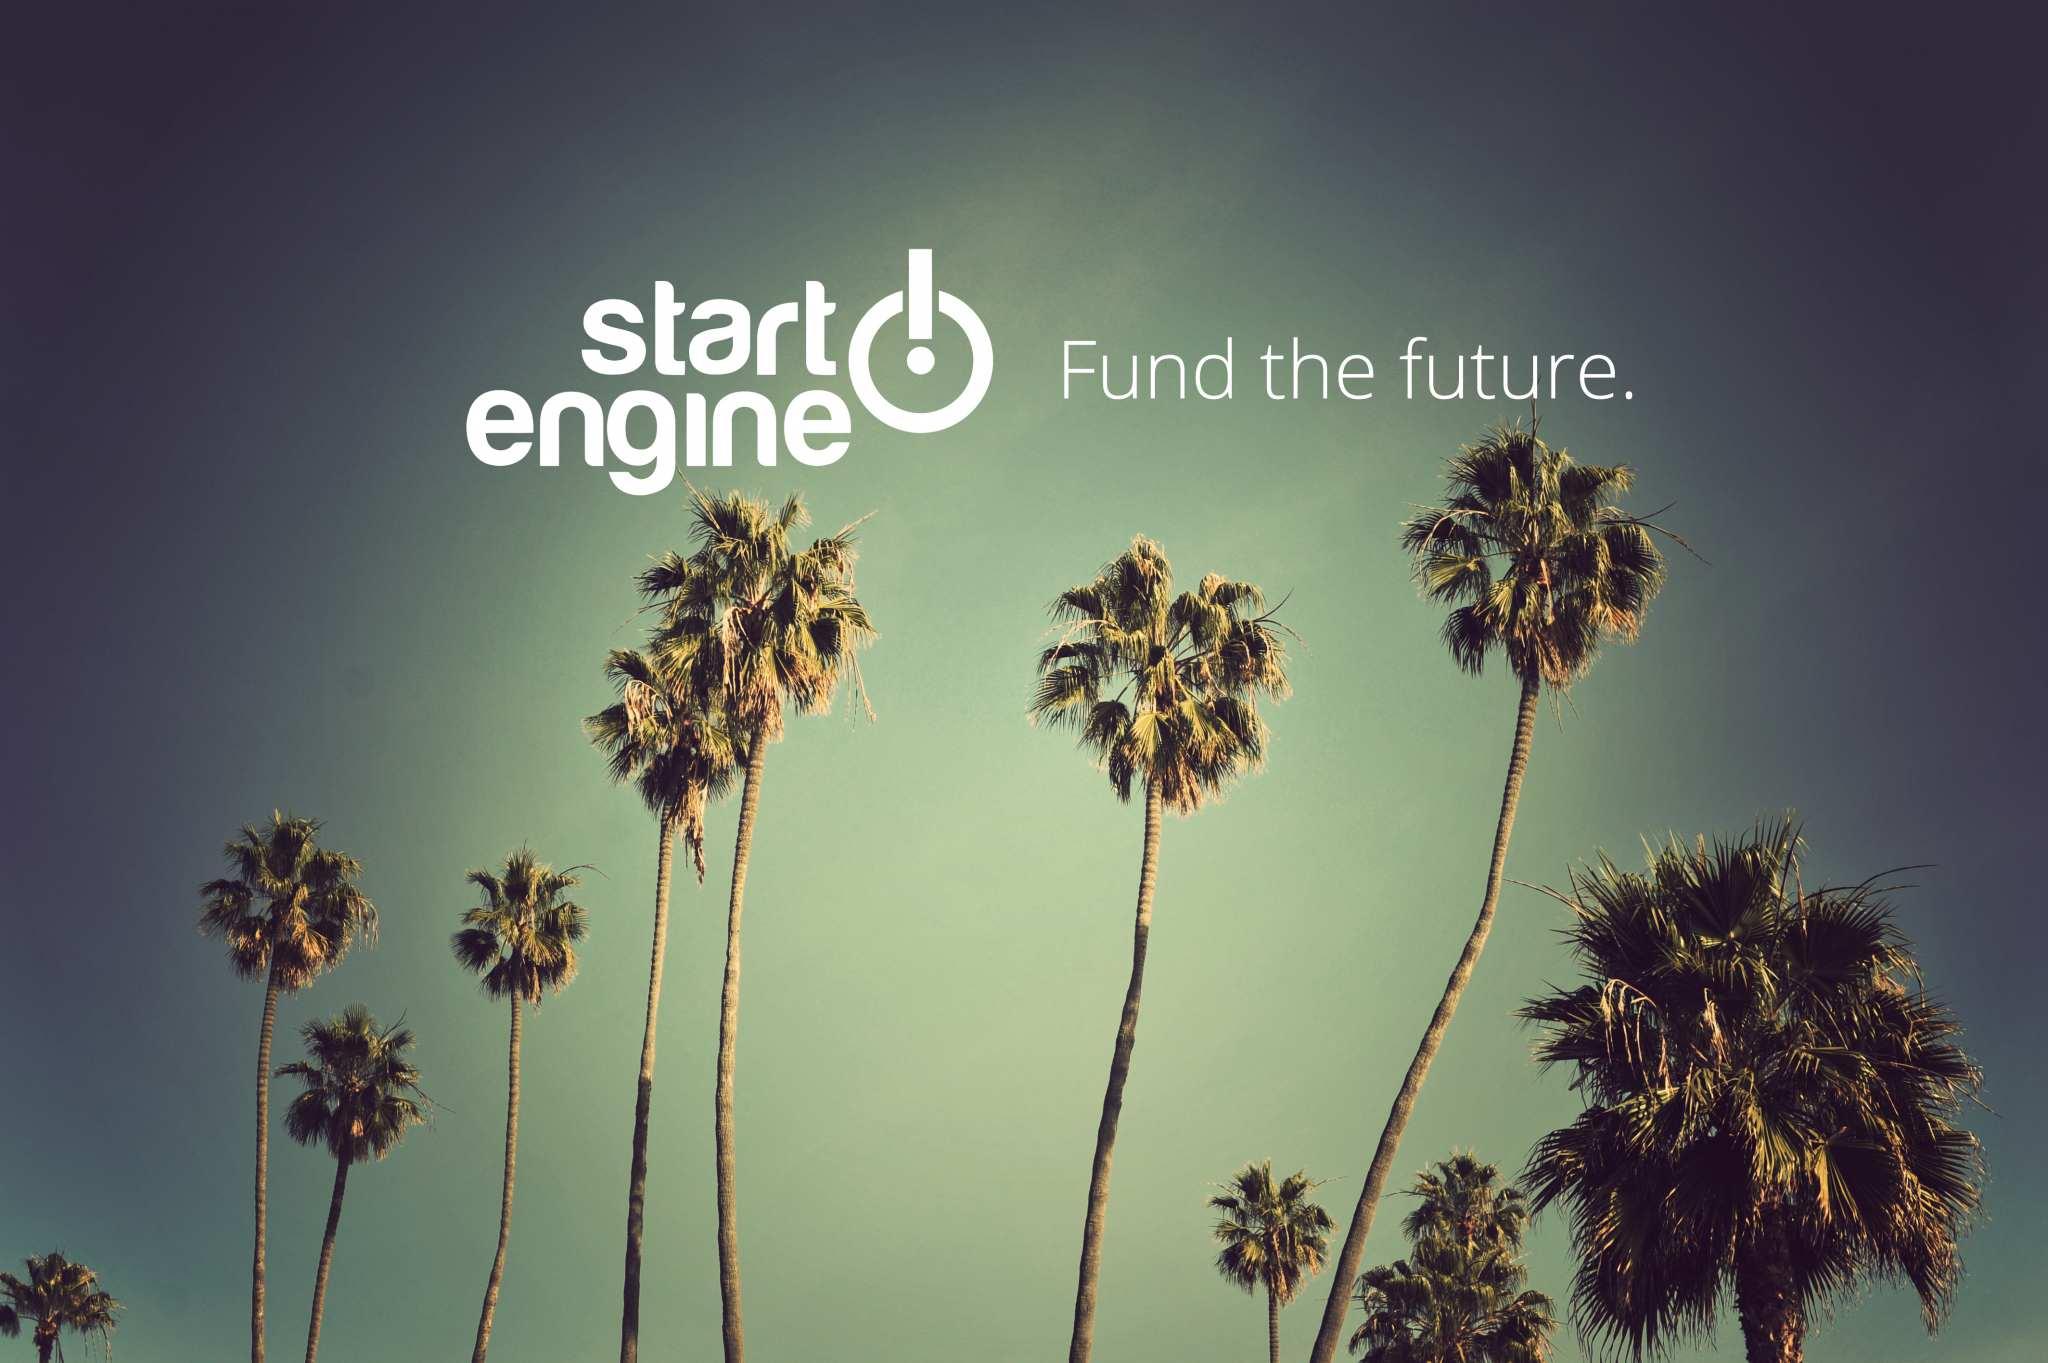 StartEngine Develops ERC-1450 protocol, While Hosting STO